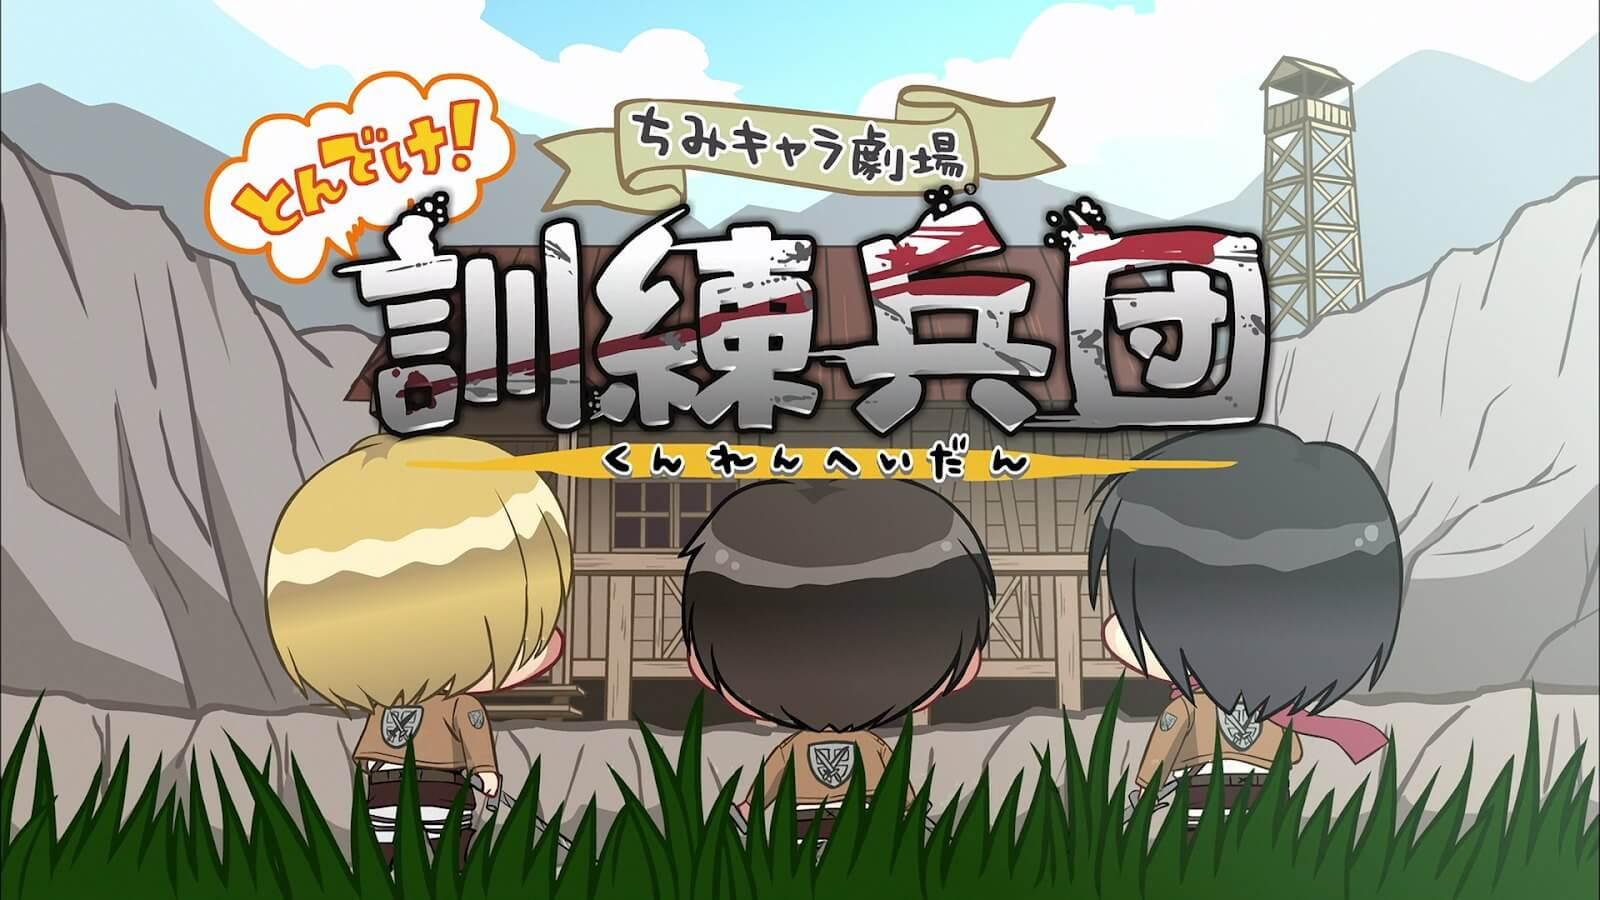 Descargar Shingeki no Kyojin Chimi Kyara Gekijo – Tondeke! Kunren Heidan subtitulado en español